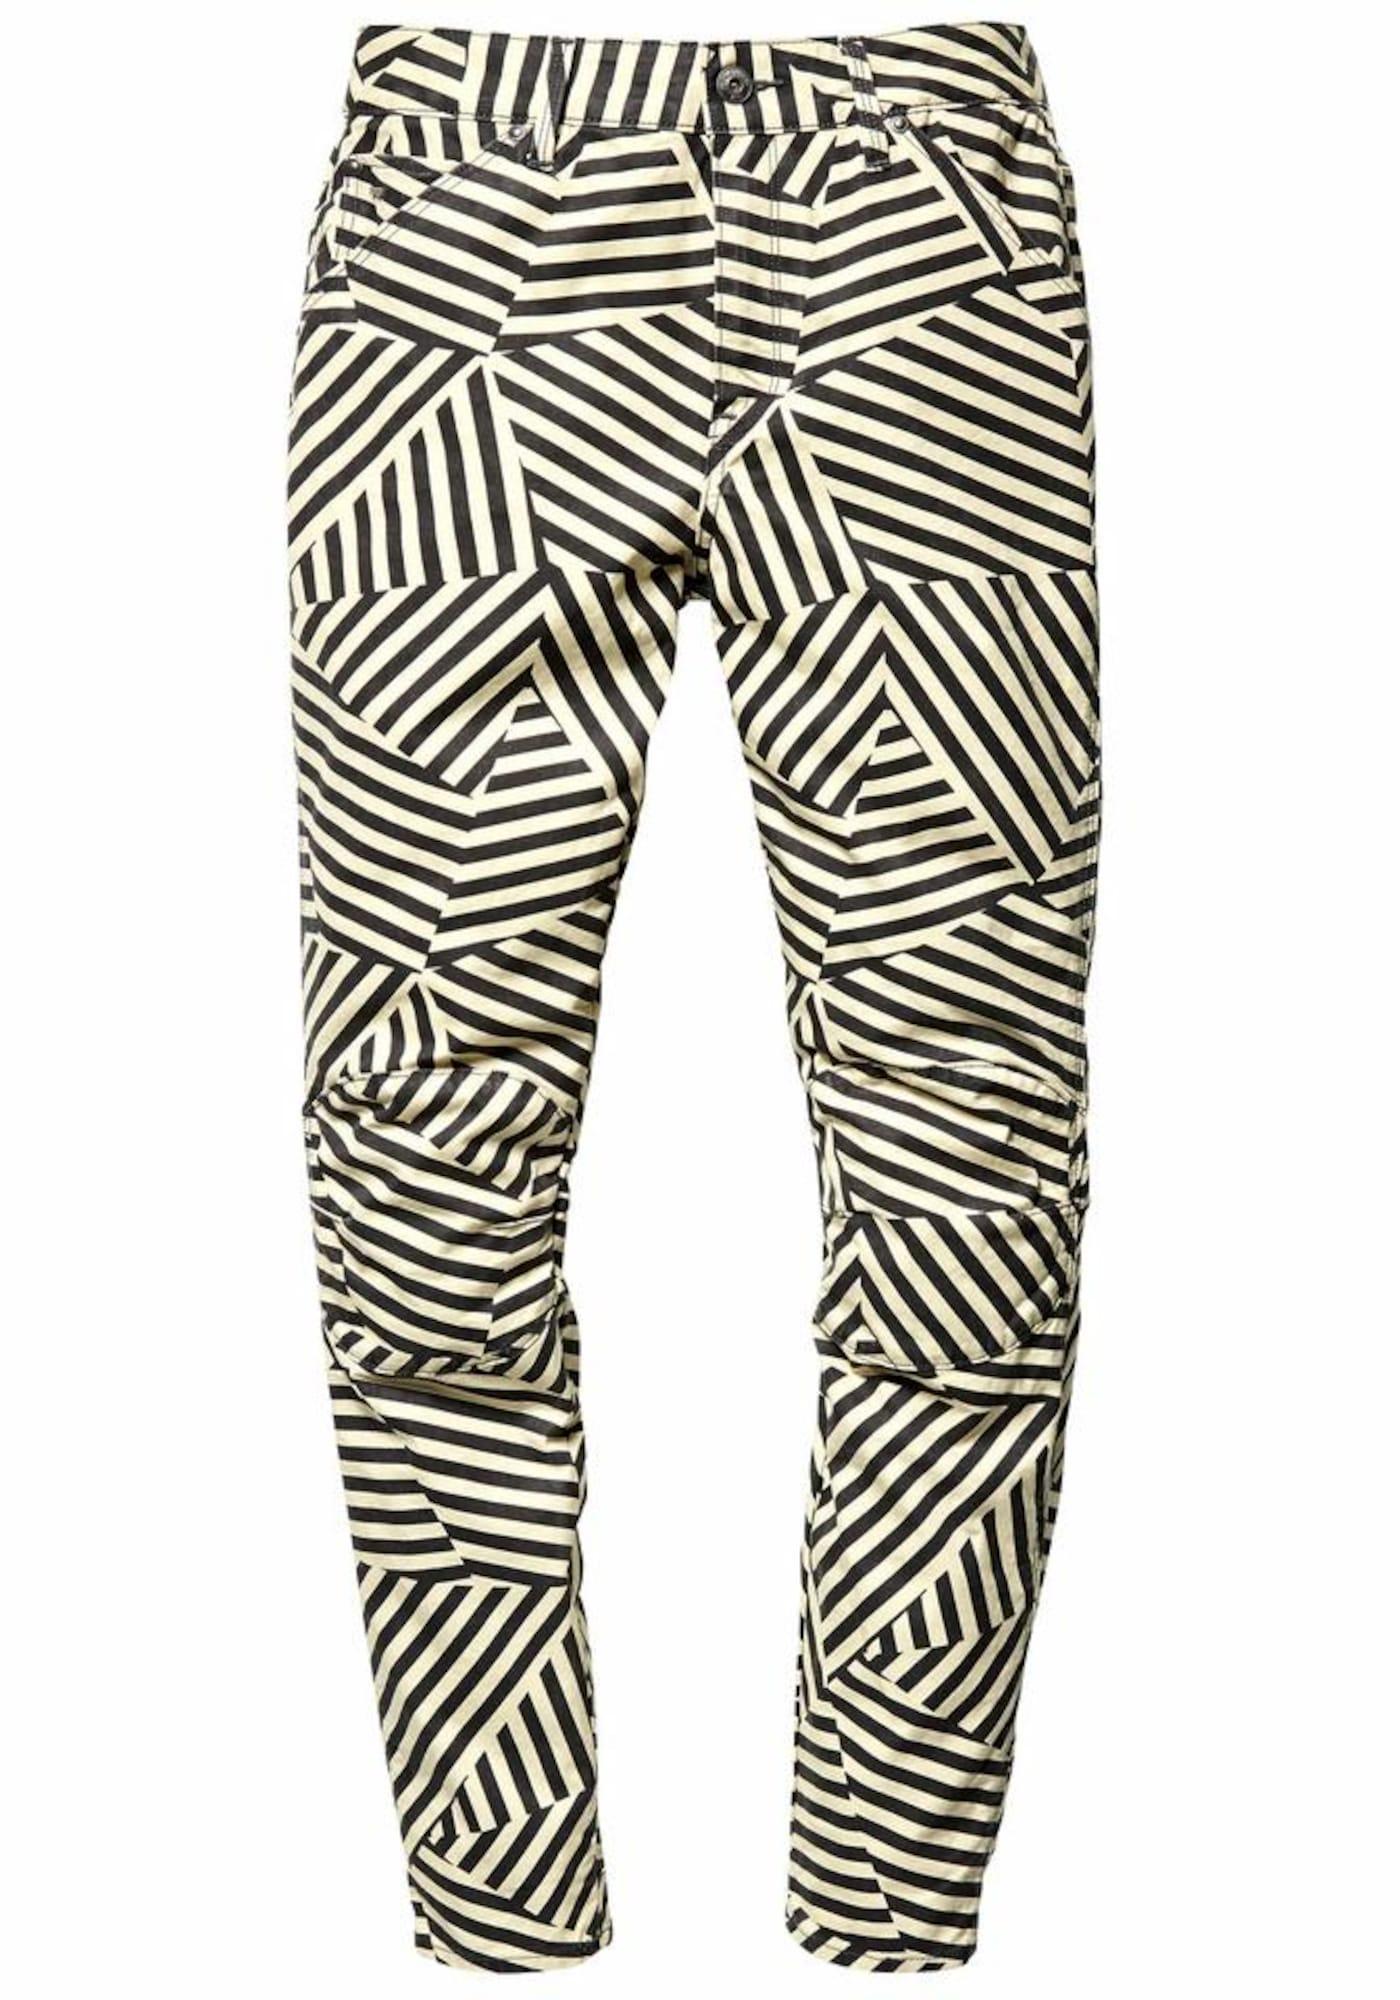 G-STAR RAW Dames Jeans Elwood 5622 3D mid boyfried COJ beige zwart